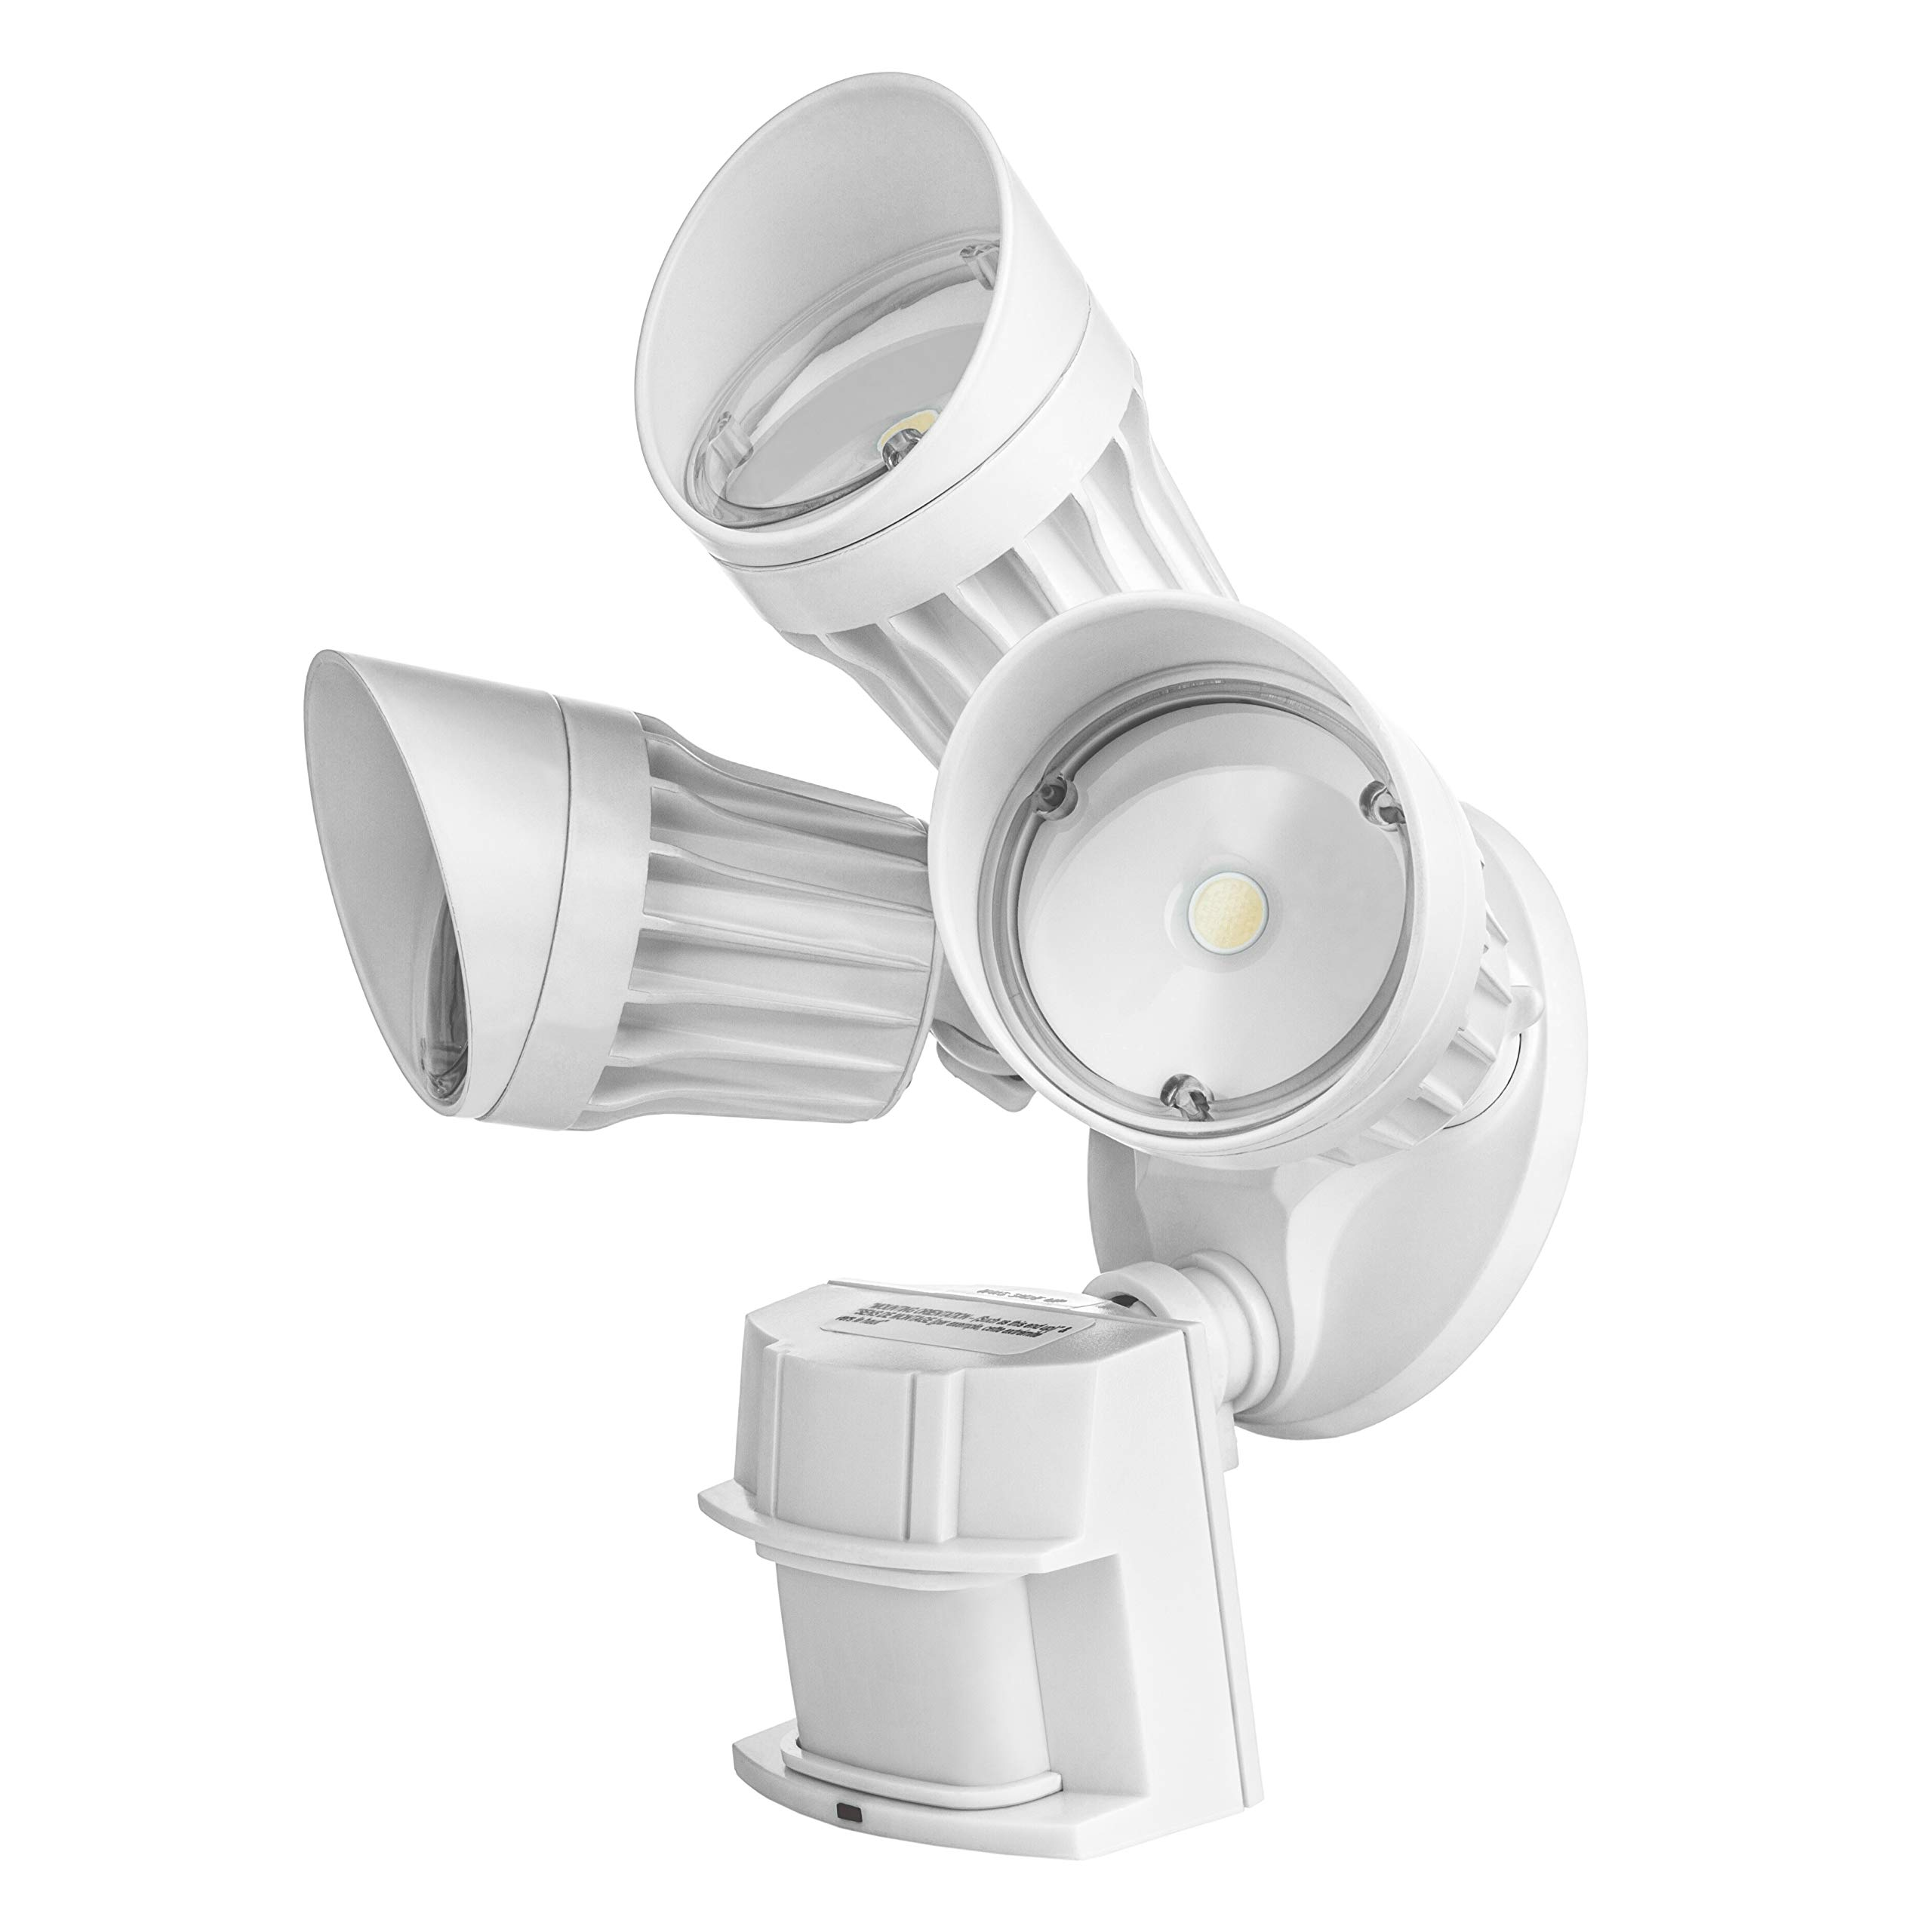 Hyperikon LED Outdoor Security Flood Light with Motion Sensor, 30W, 3 Head, White, LED Motion Light, Garage, Front Yard 5000K